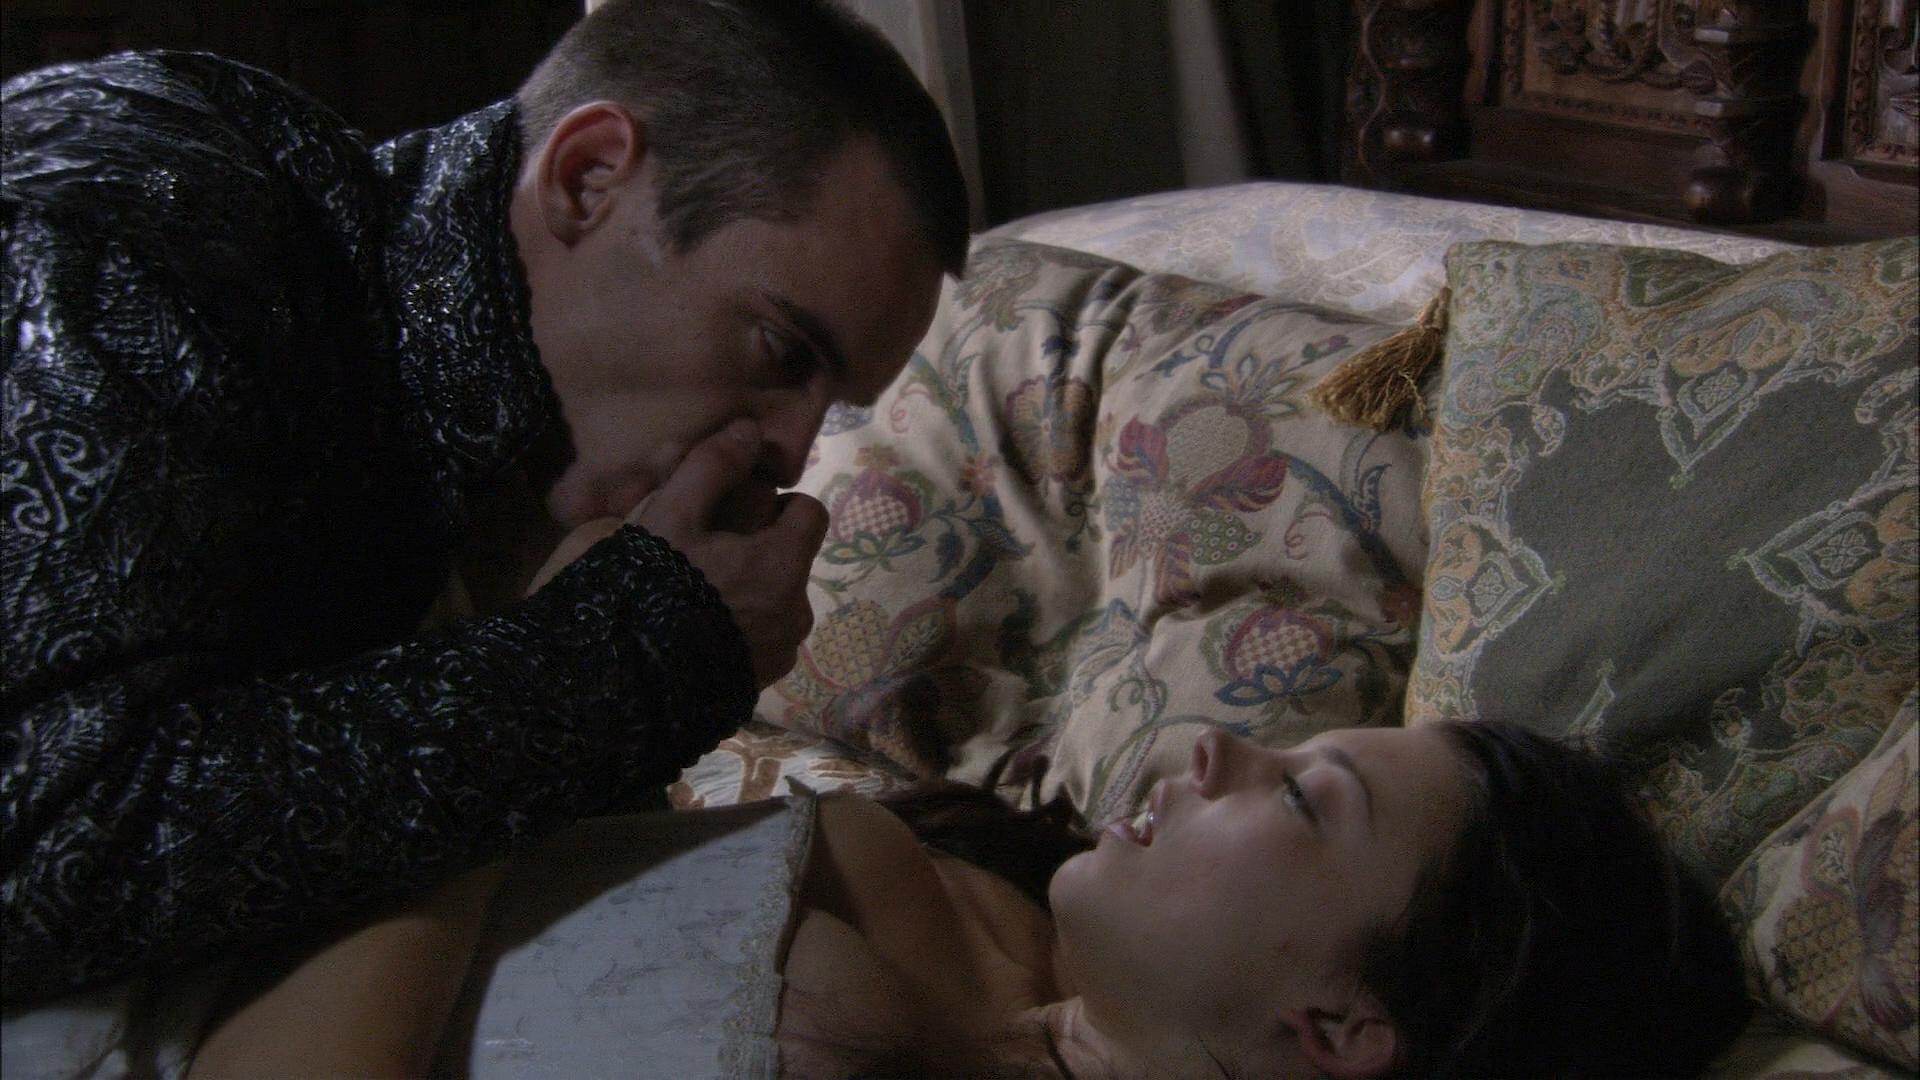 Natalie Dormer hot sex and Gabrielle Anwar hot - The Tudors (2007) S01E05 HD 1080p (3)